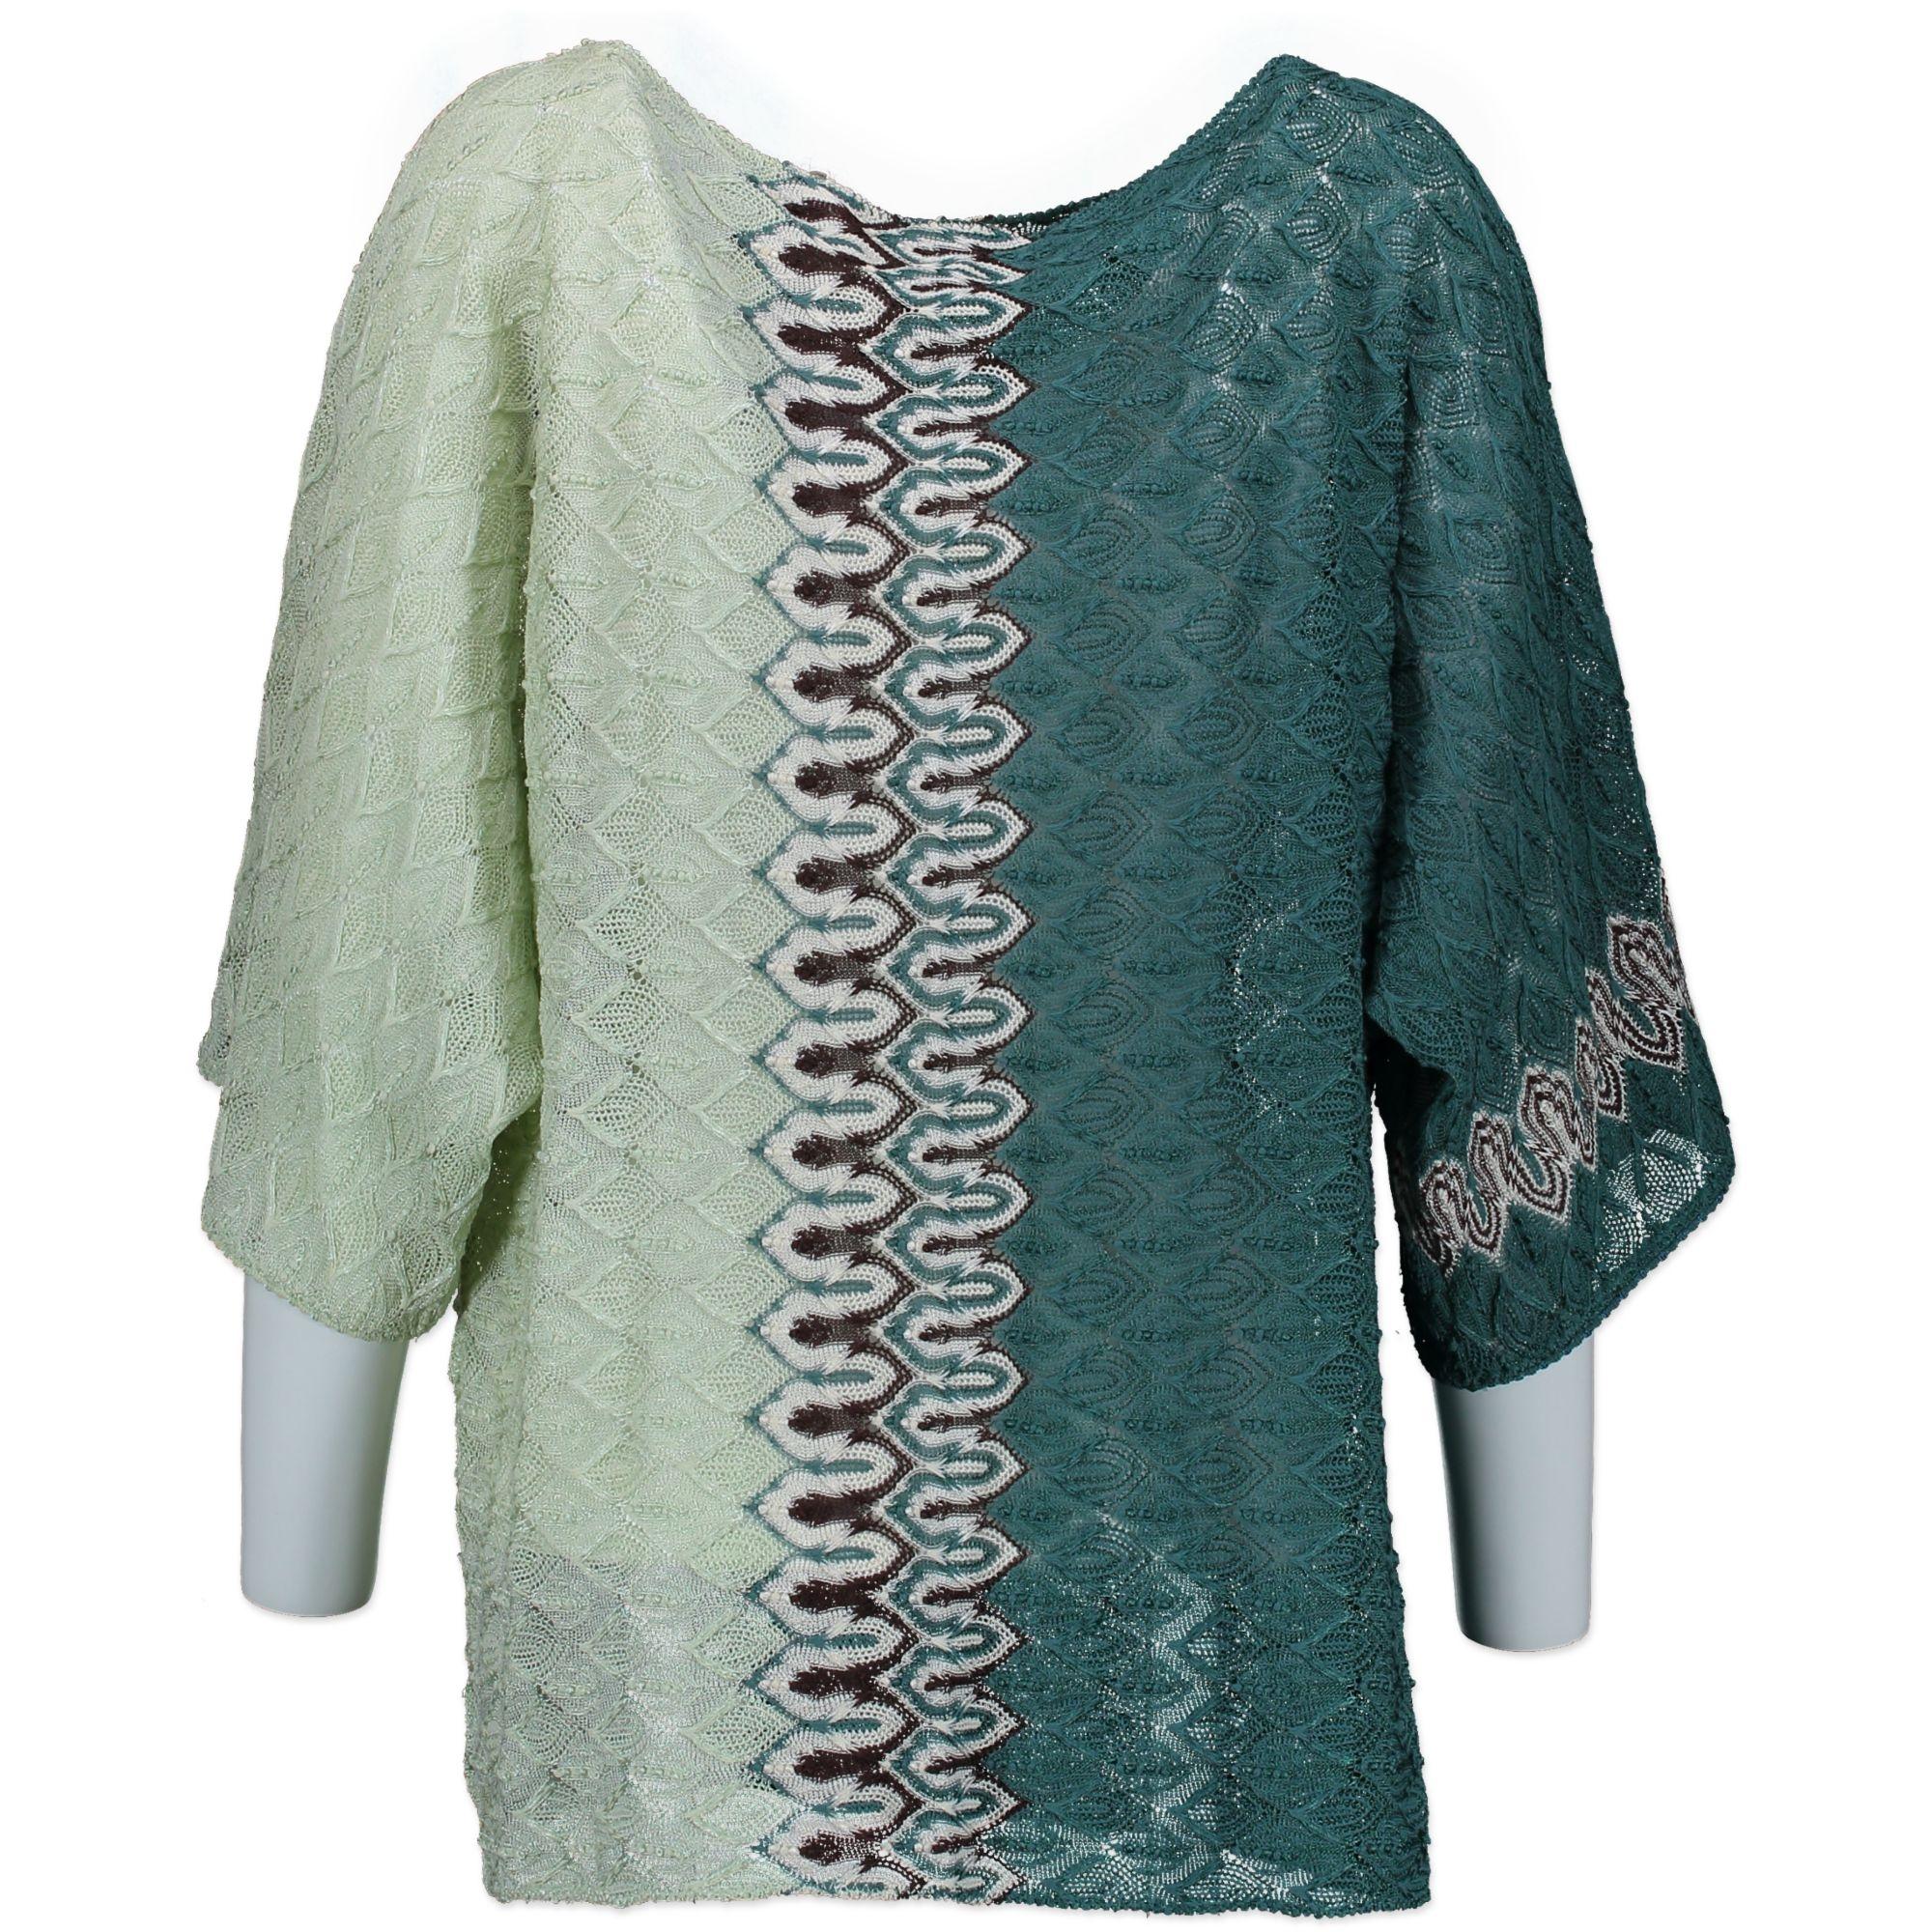 a6e73615dff Buy authentic Missoni multicolor dress at the right price at Labellov  designer vintage webshop.